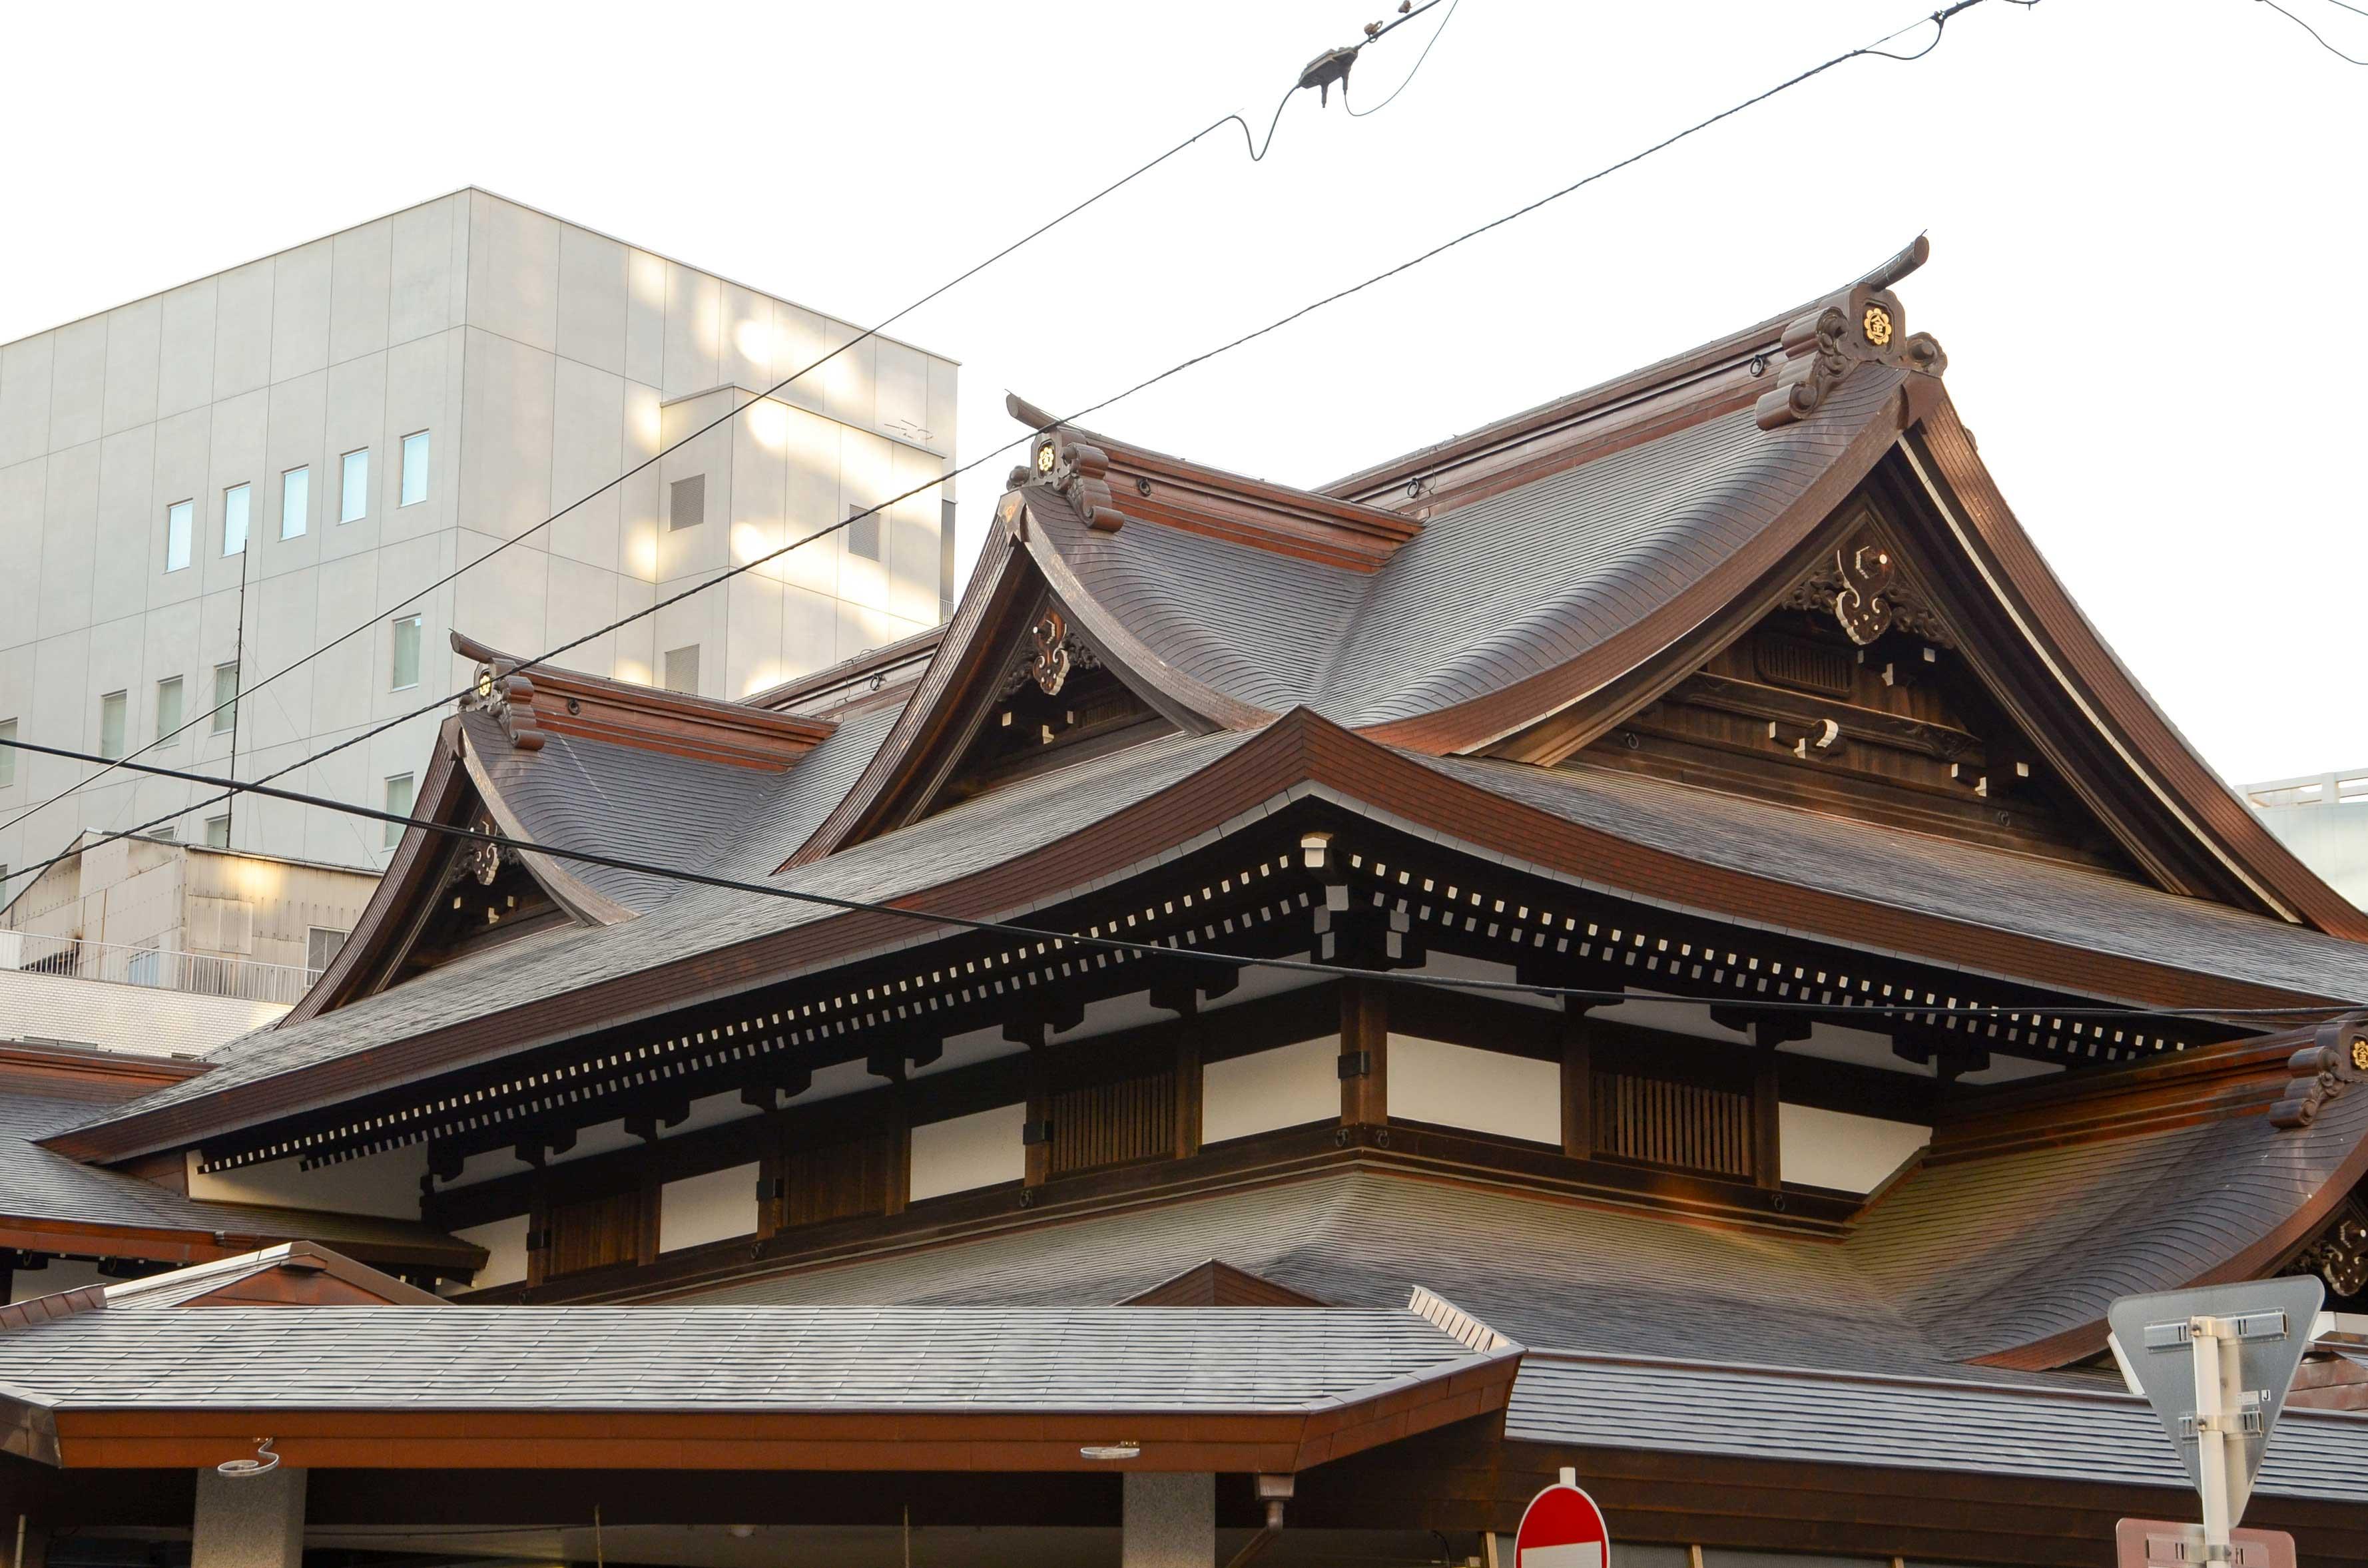 <p>主屋頂上方</p>西南角的玄関是主入口。其角度可見華美千鳥破風。